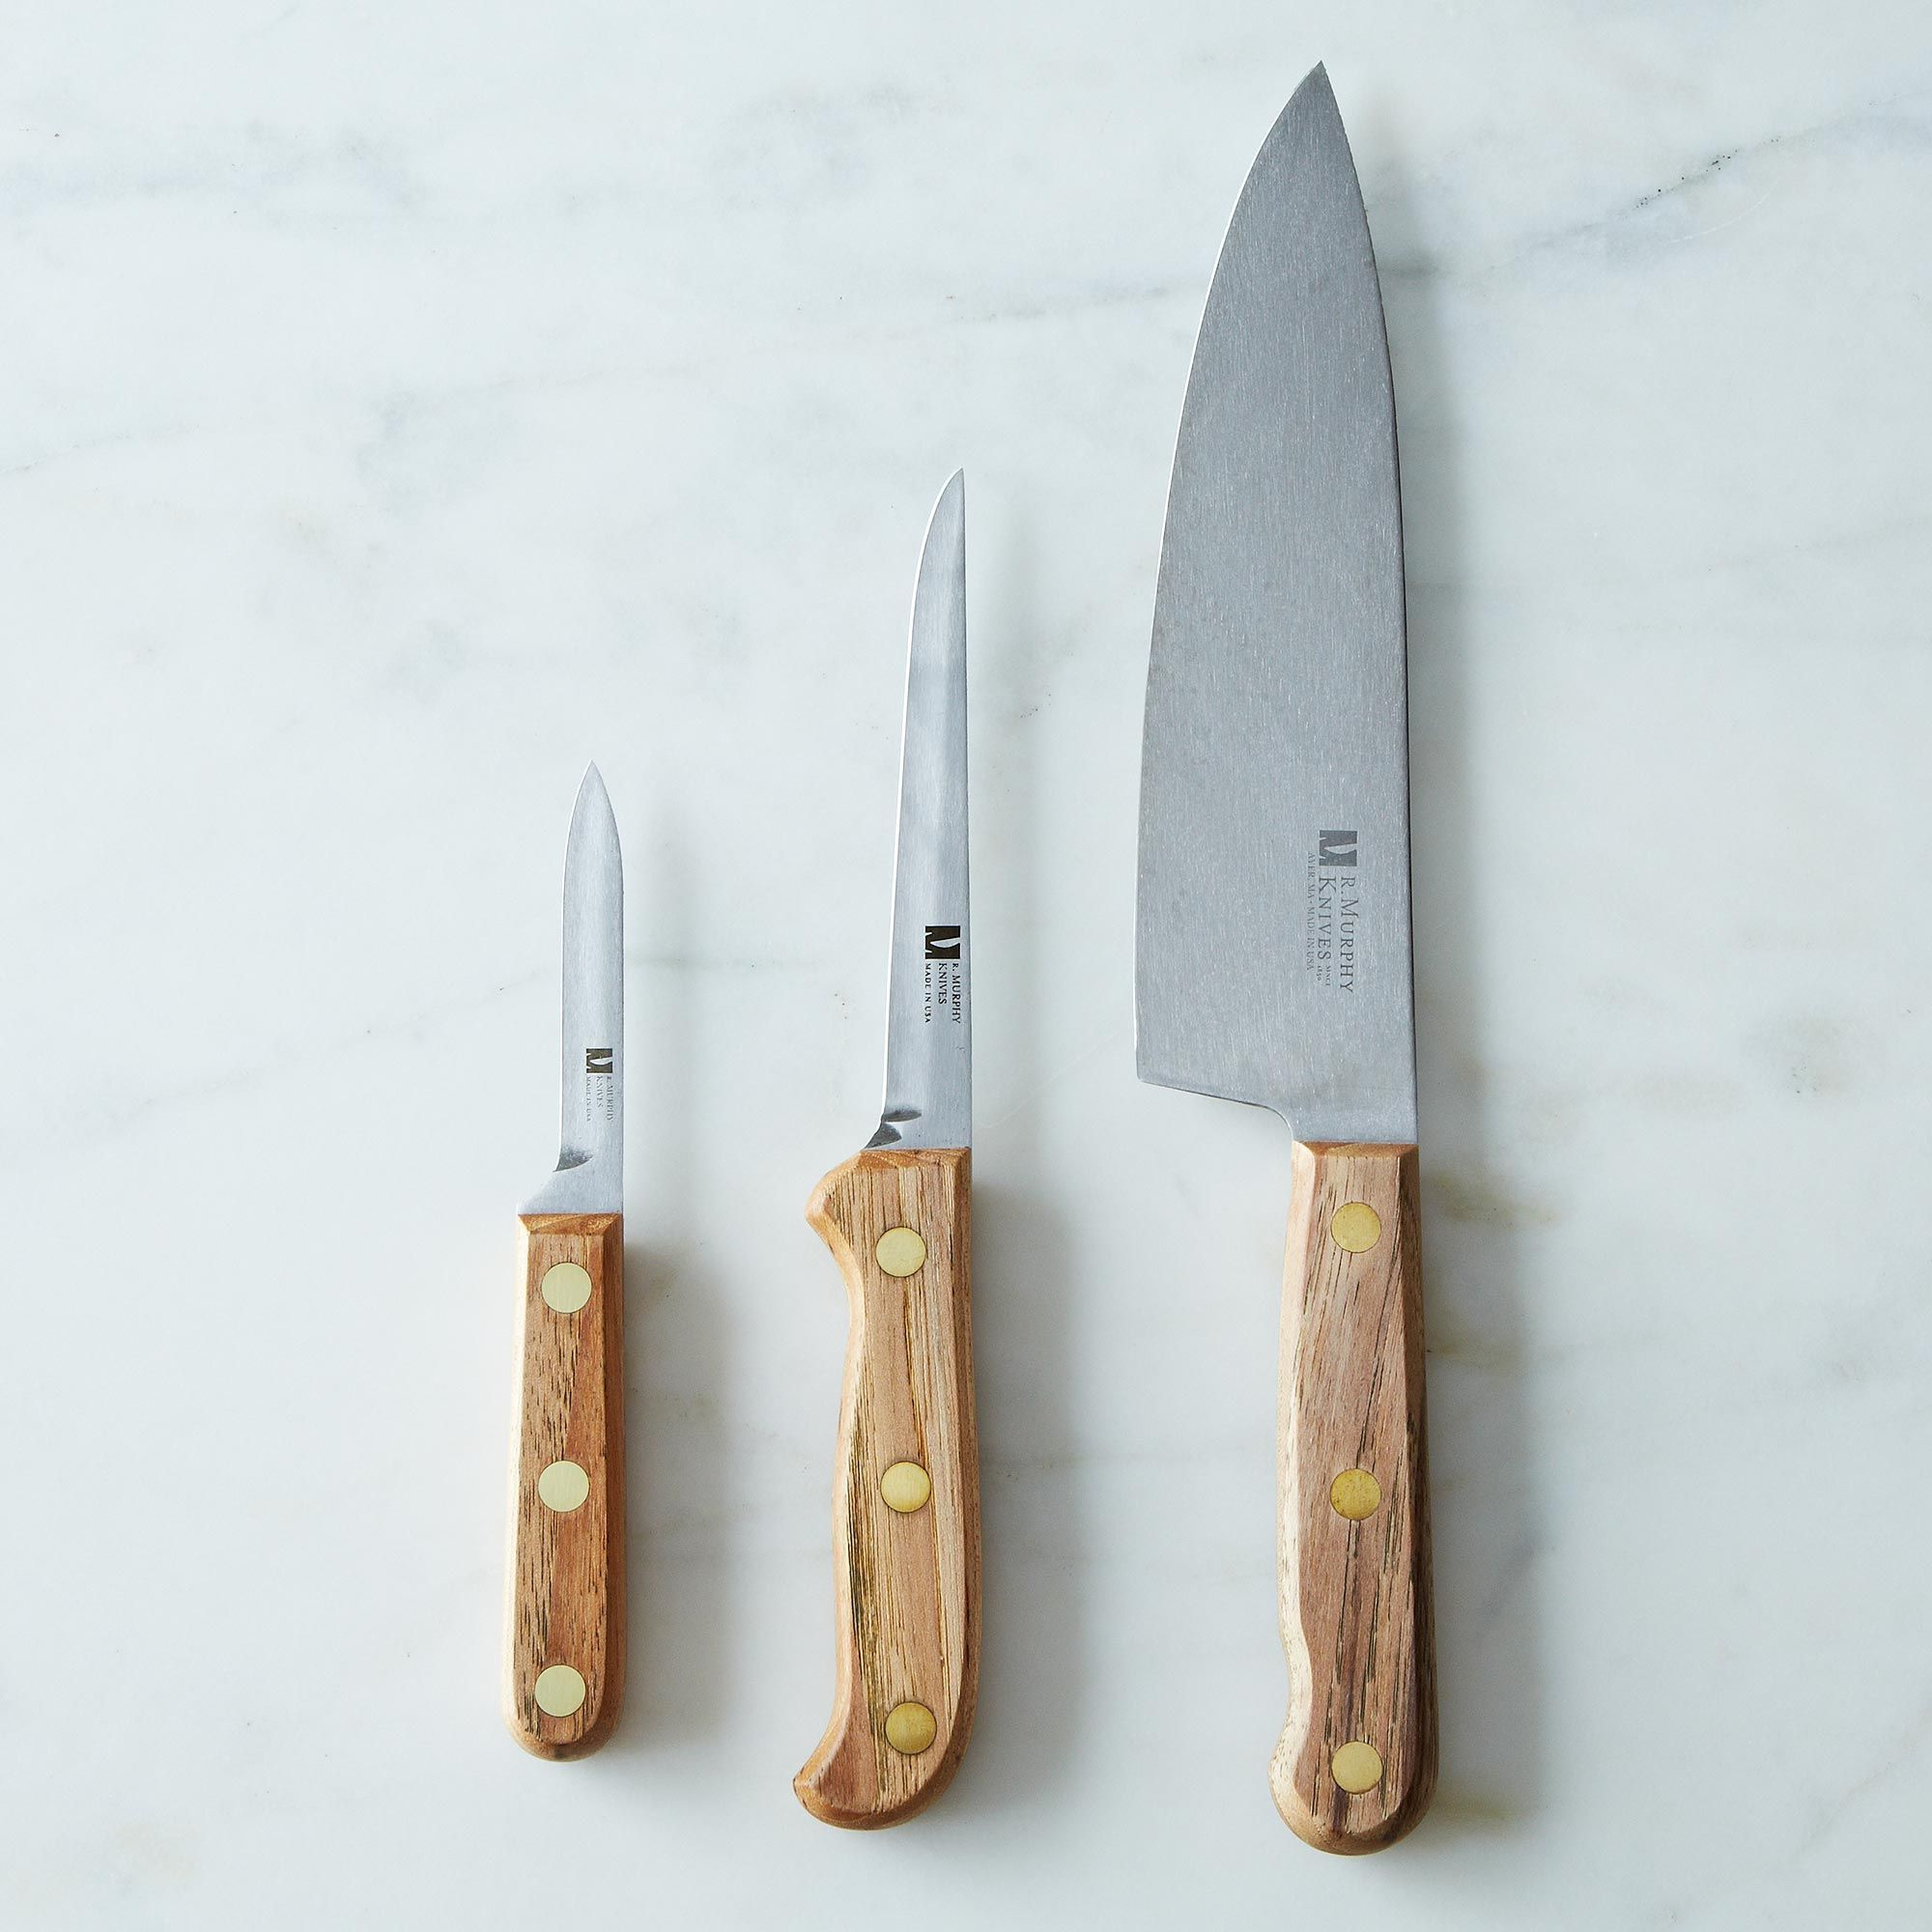 6a47a6ef 617a 4695 bf50 ba596ab1ba4a  2013 0909 r murphy chefs knives set 005